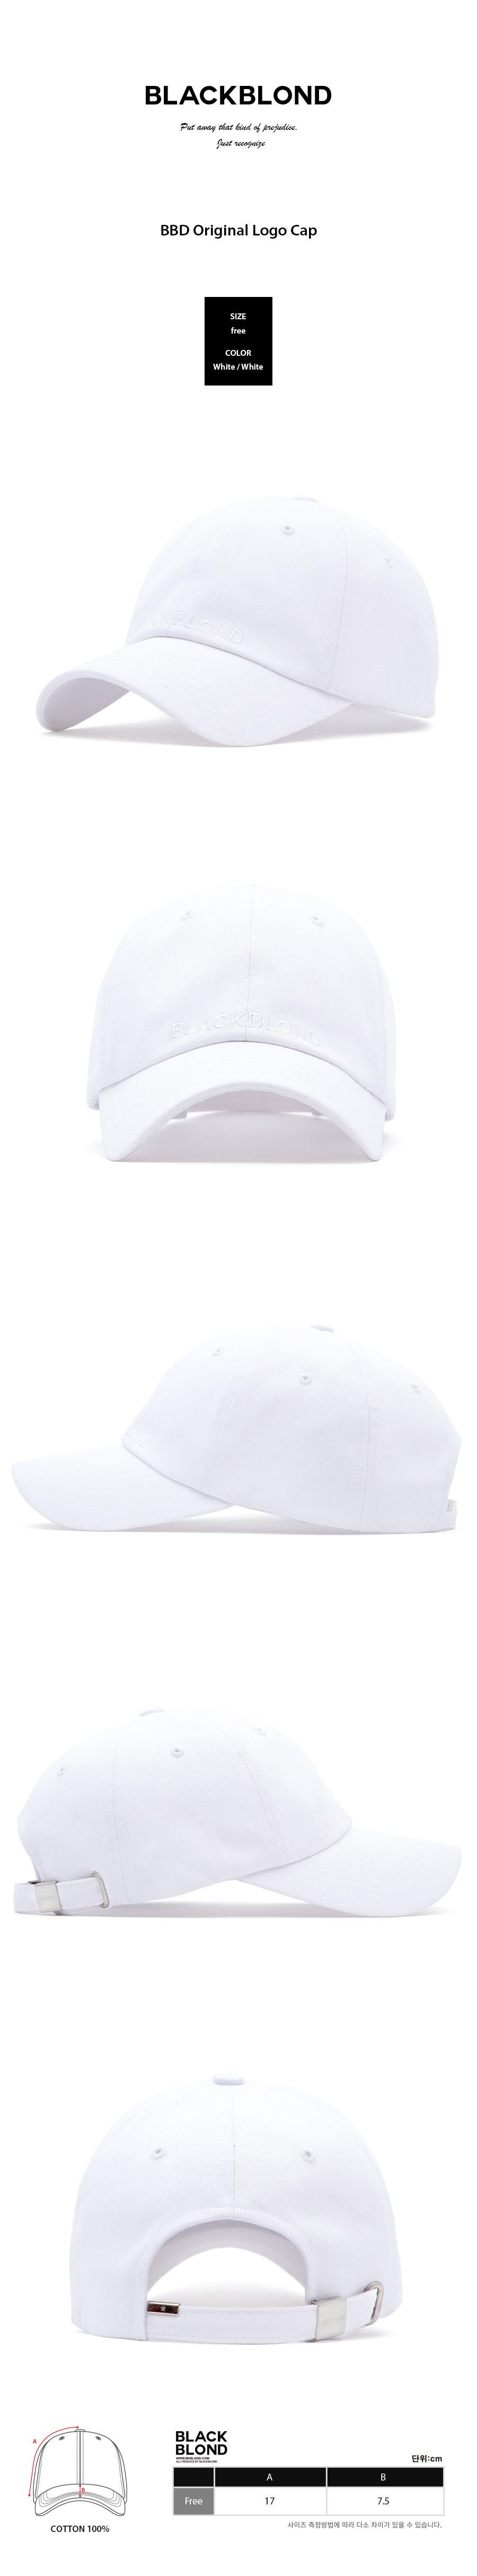 BBD-Original-Logo-Cap-%28White_White%29.jpg